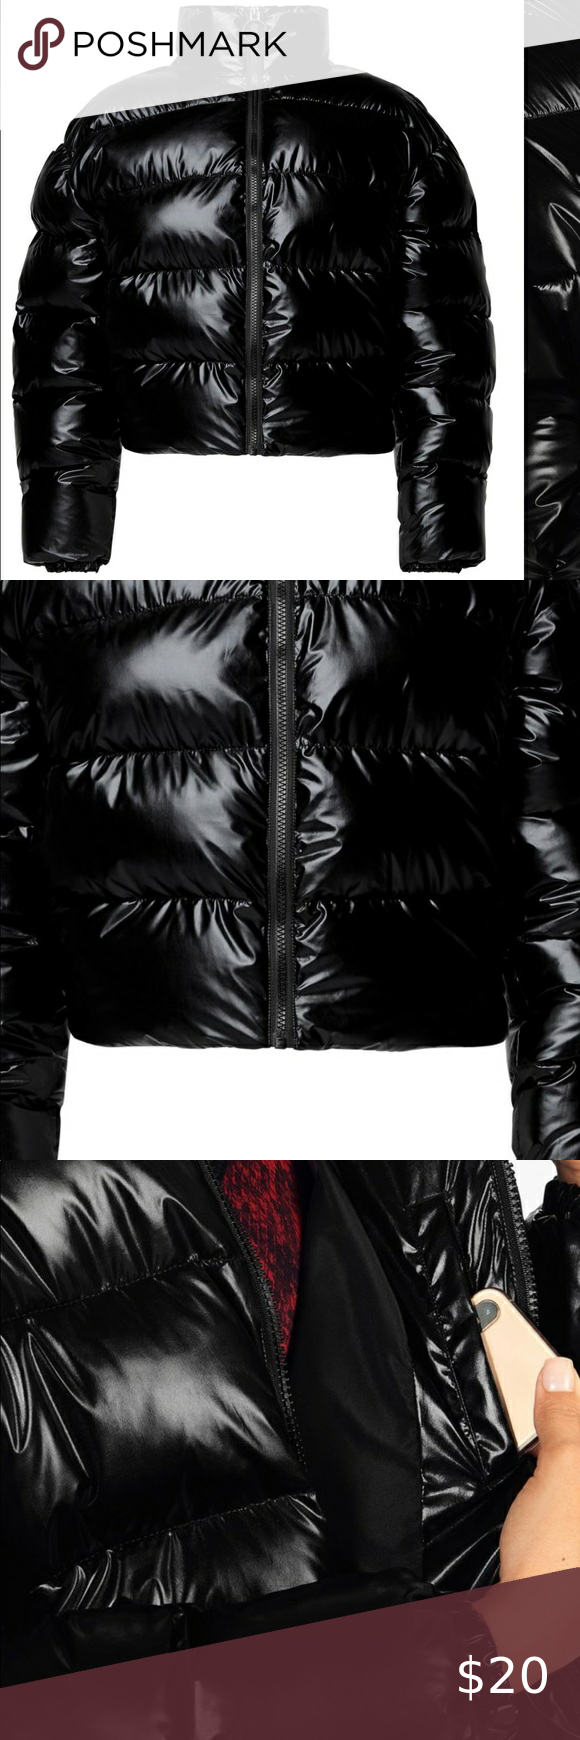 Fabletics Wander Puffer Jacket Jackets Puffer Jackets Fabletics [ 1740 x 580 Pixel ]